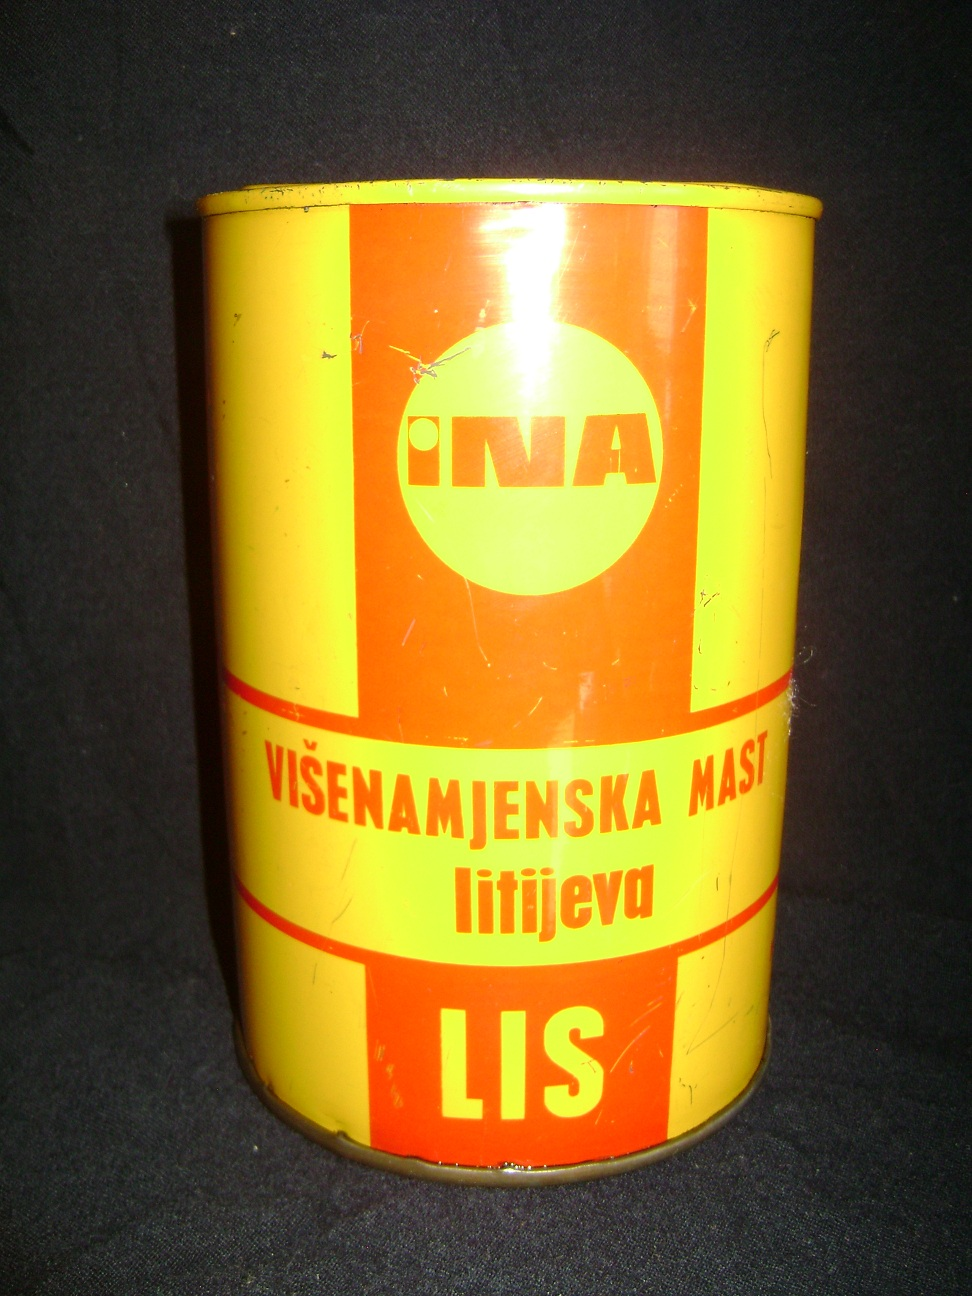 Limena_kutija_INA_rafinerija_1.JPG